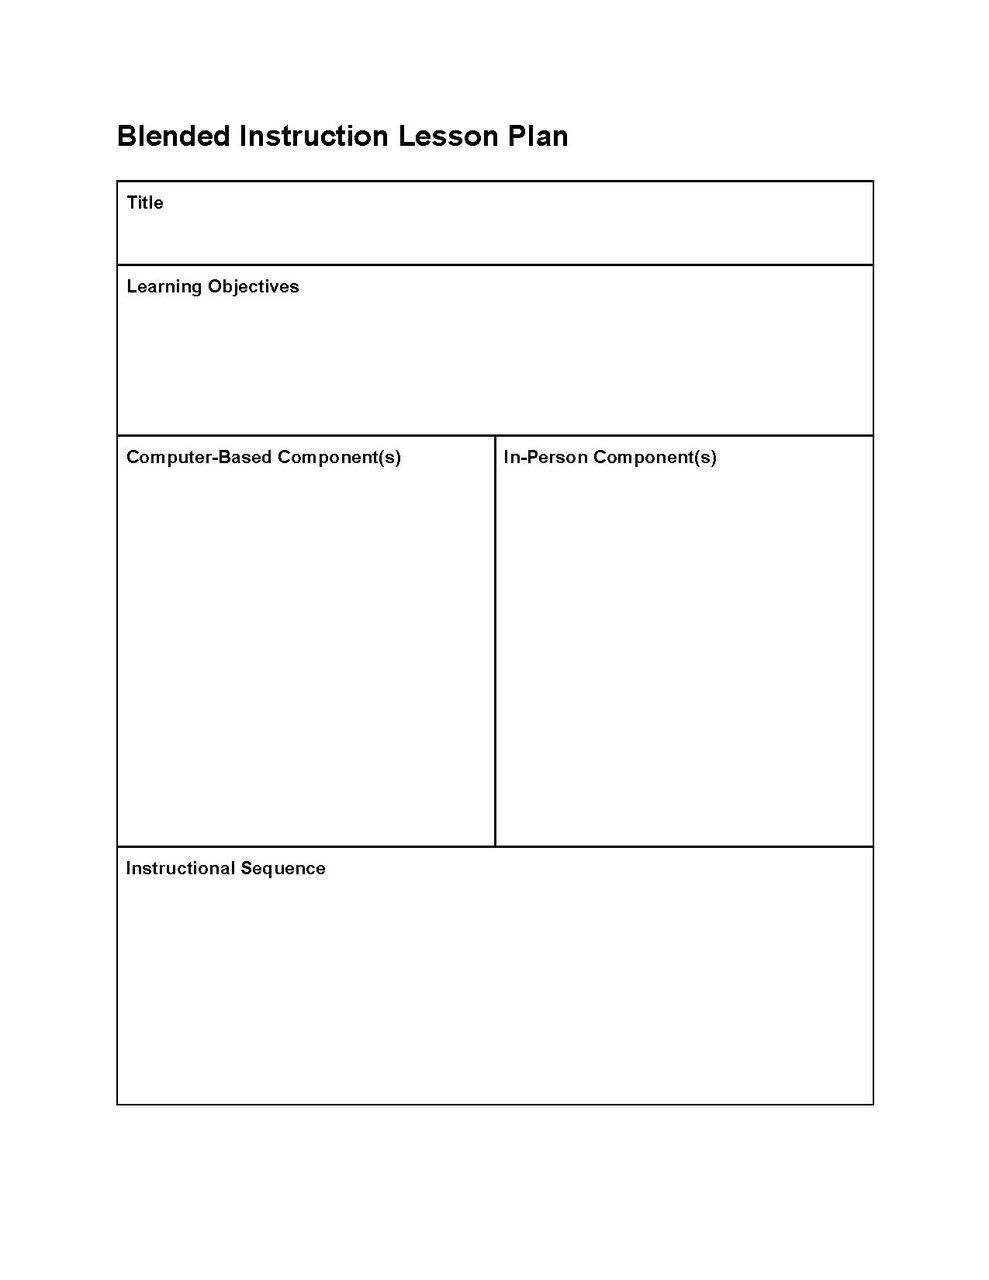 000 Fascinating Editable Lesson Plan Template Idea  Templates For Preschool Word FreeFull